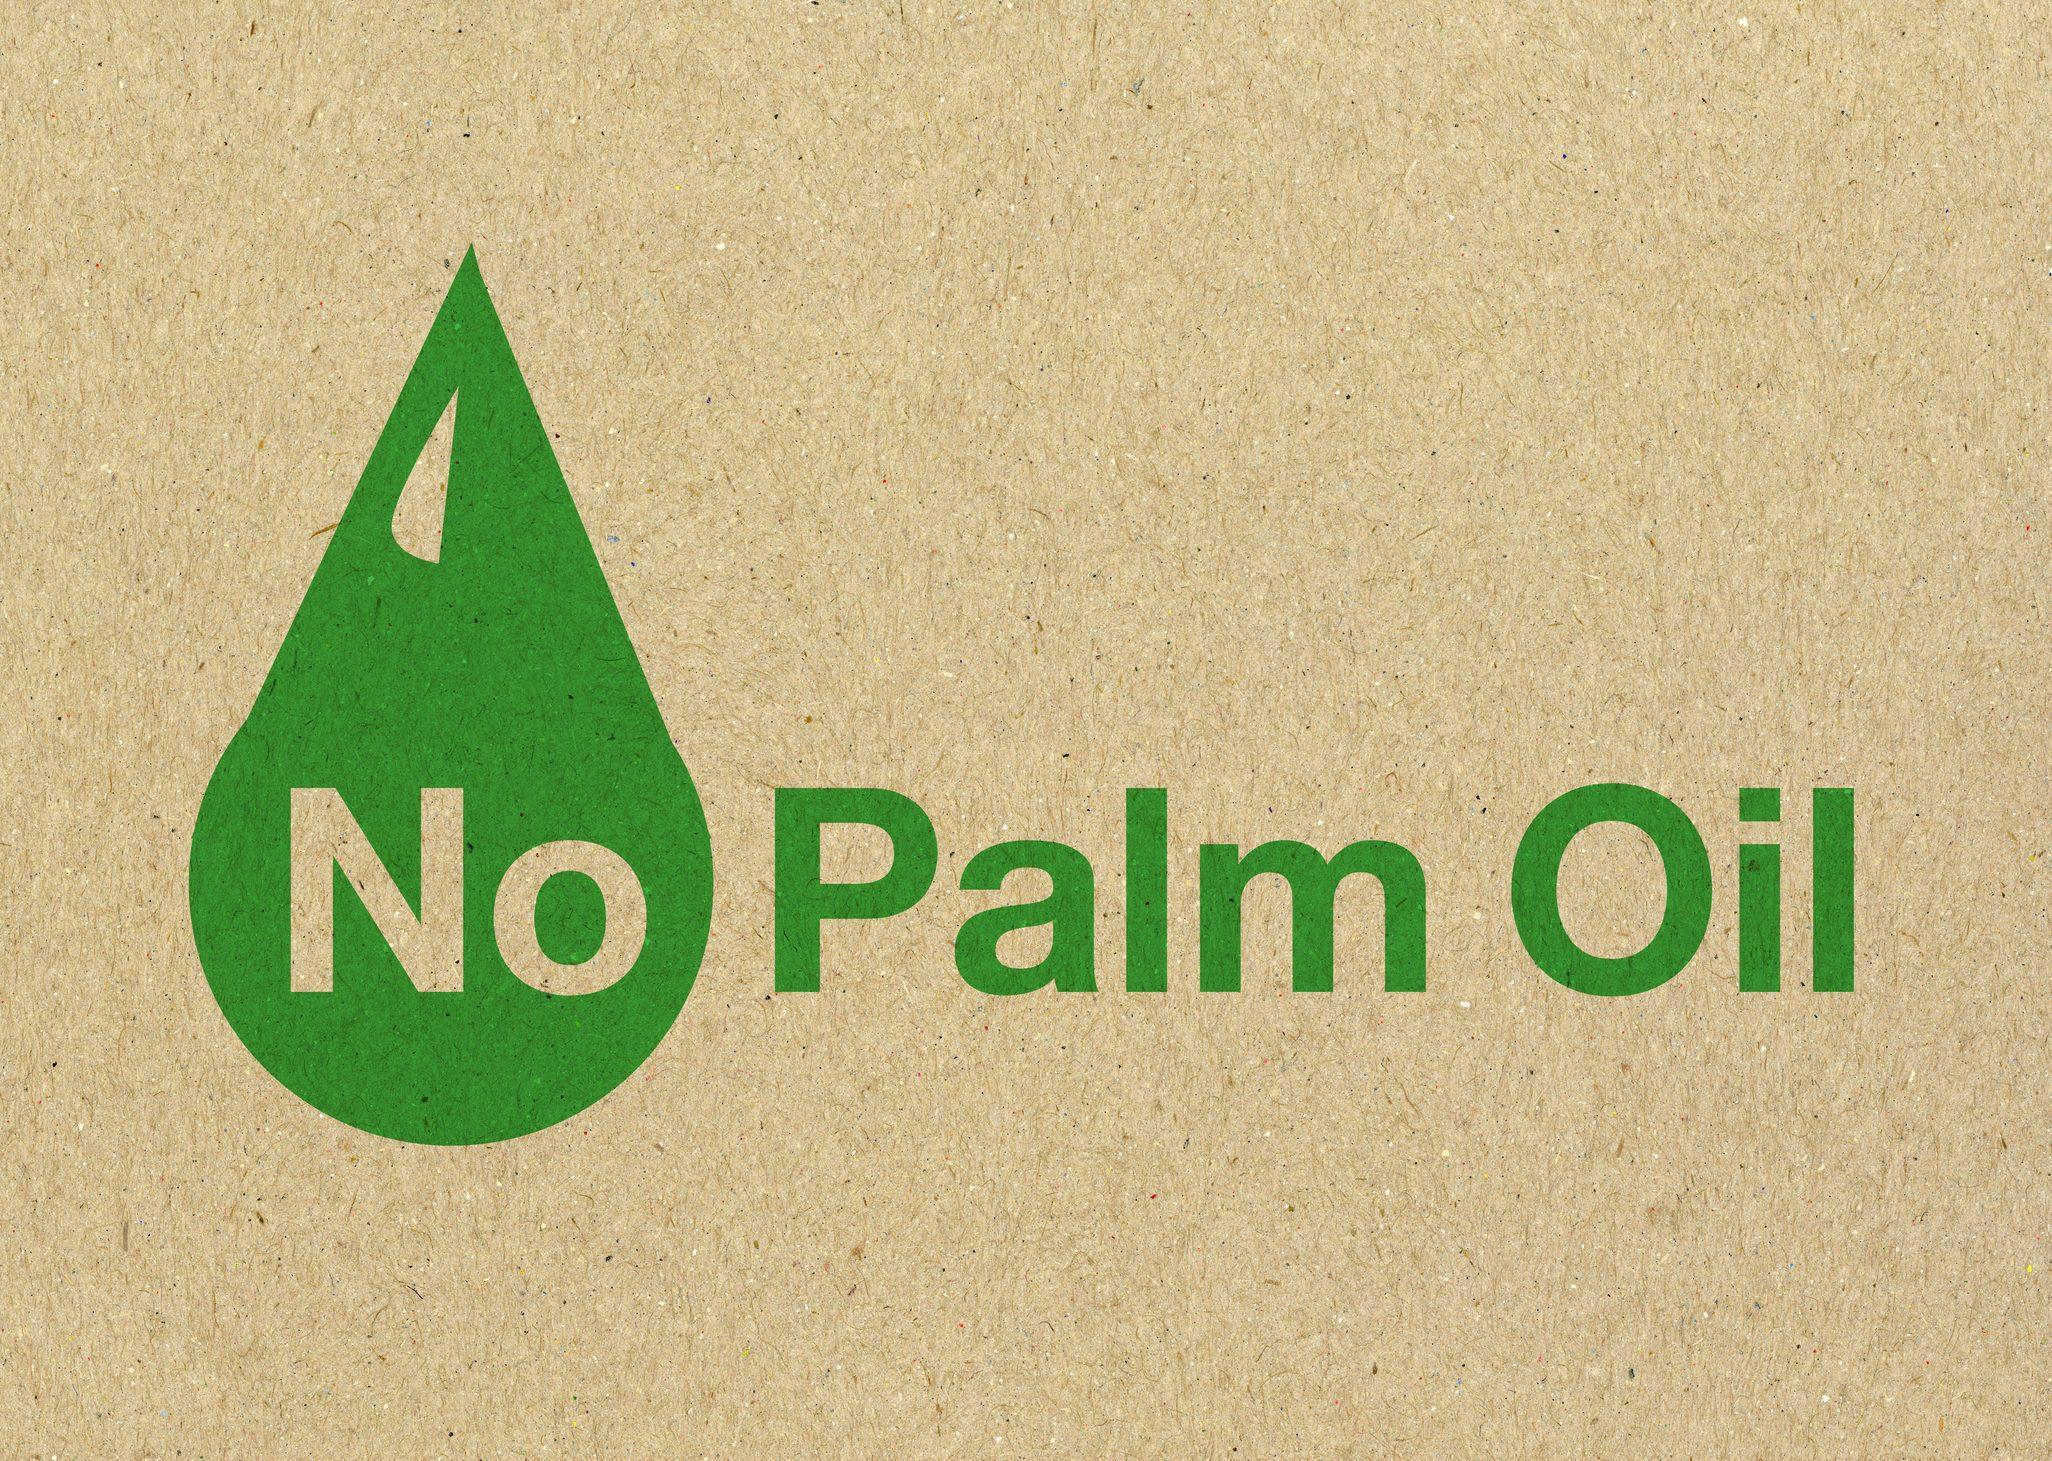 No palm oil